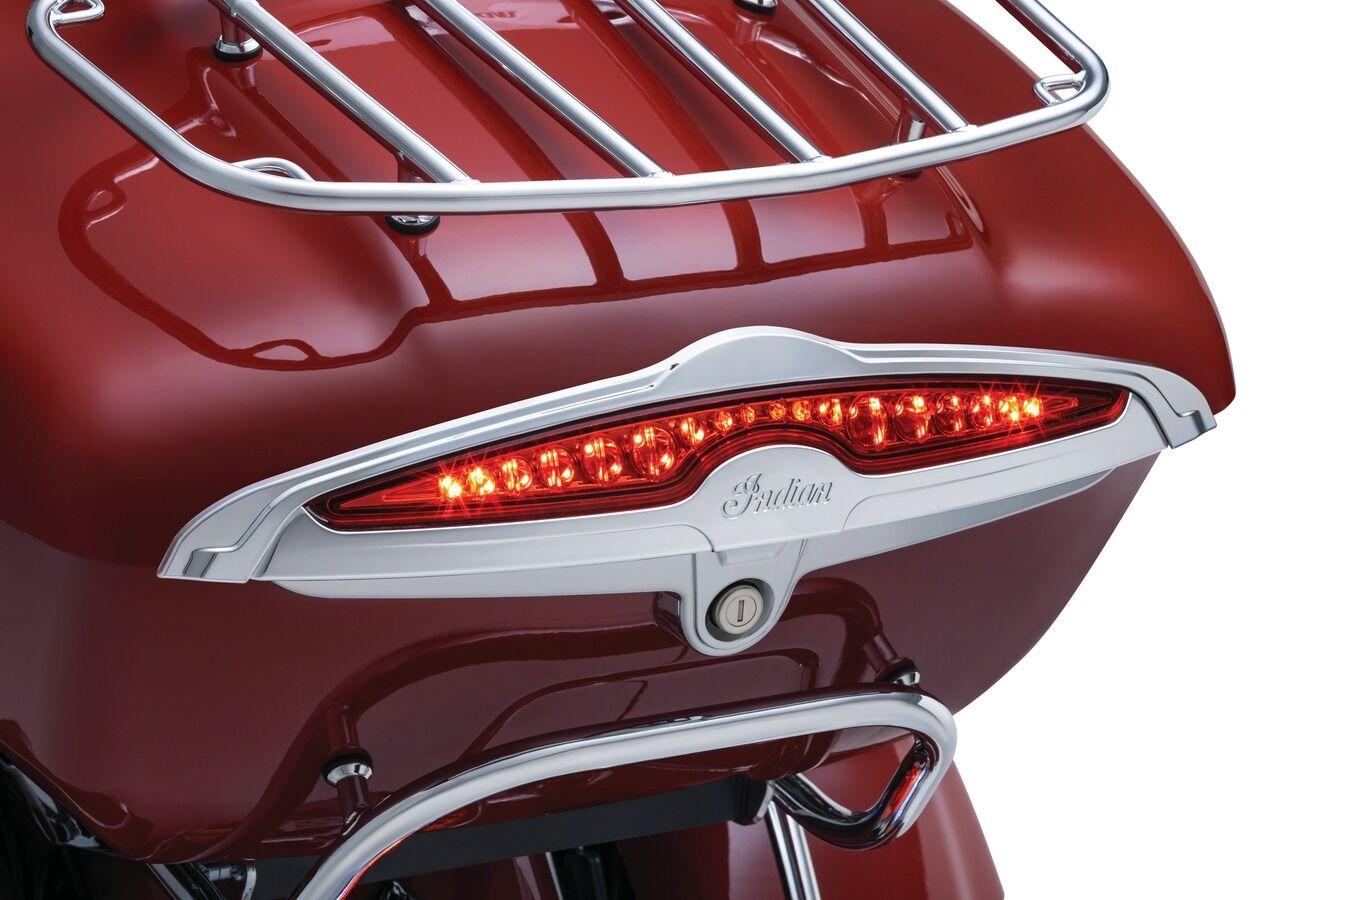 Kuryakyn Chrome Rear Tour Pak Trunk Light Accent Roadmaster Indian 2015-2018